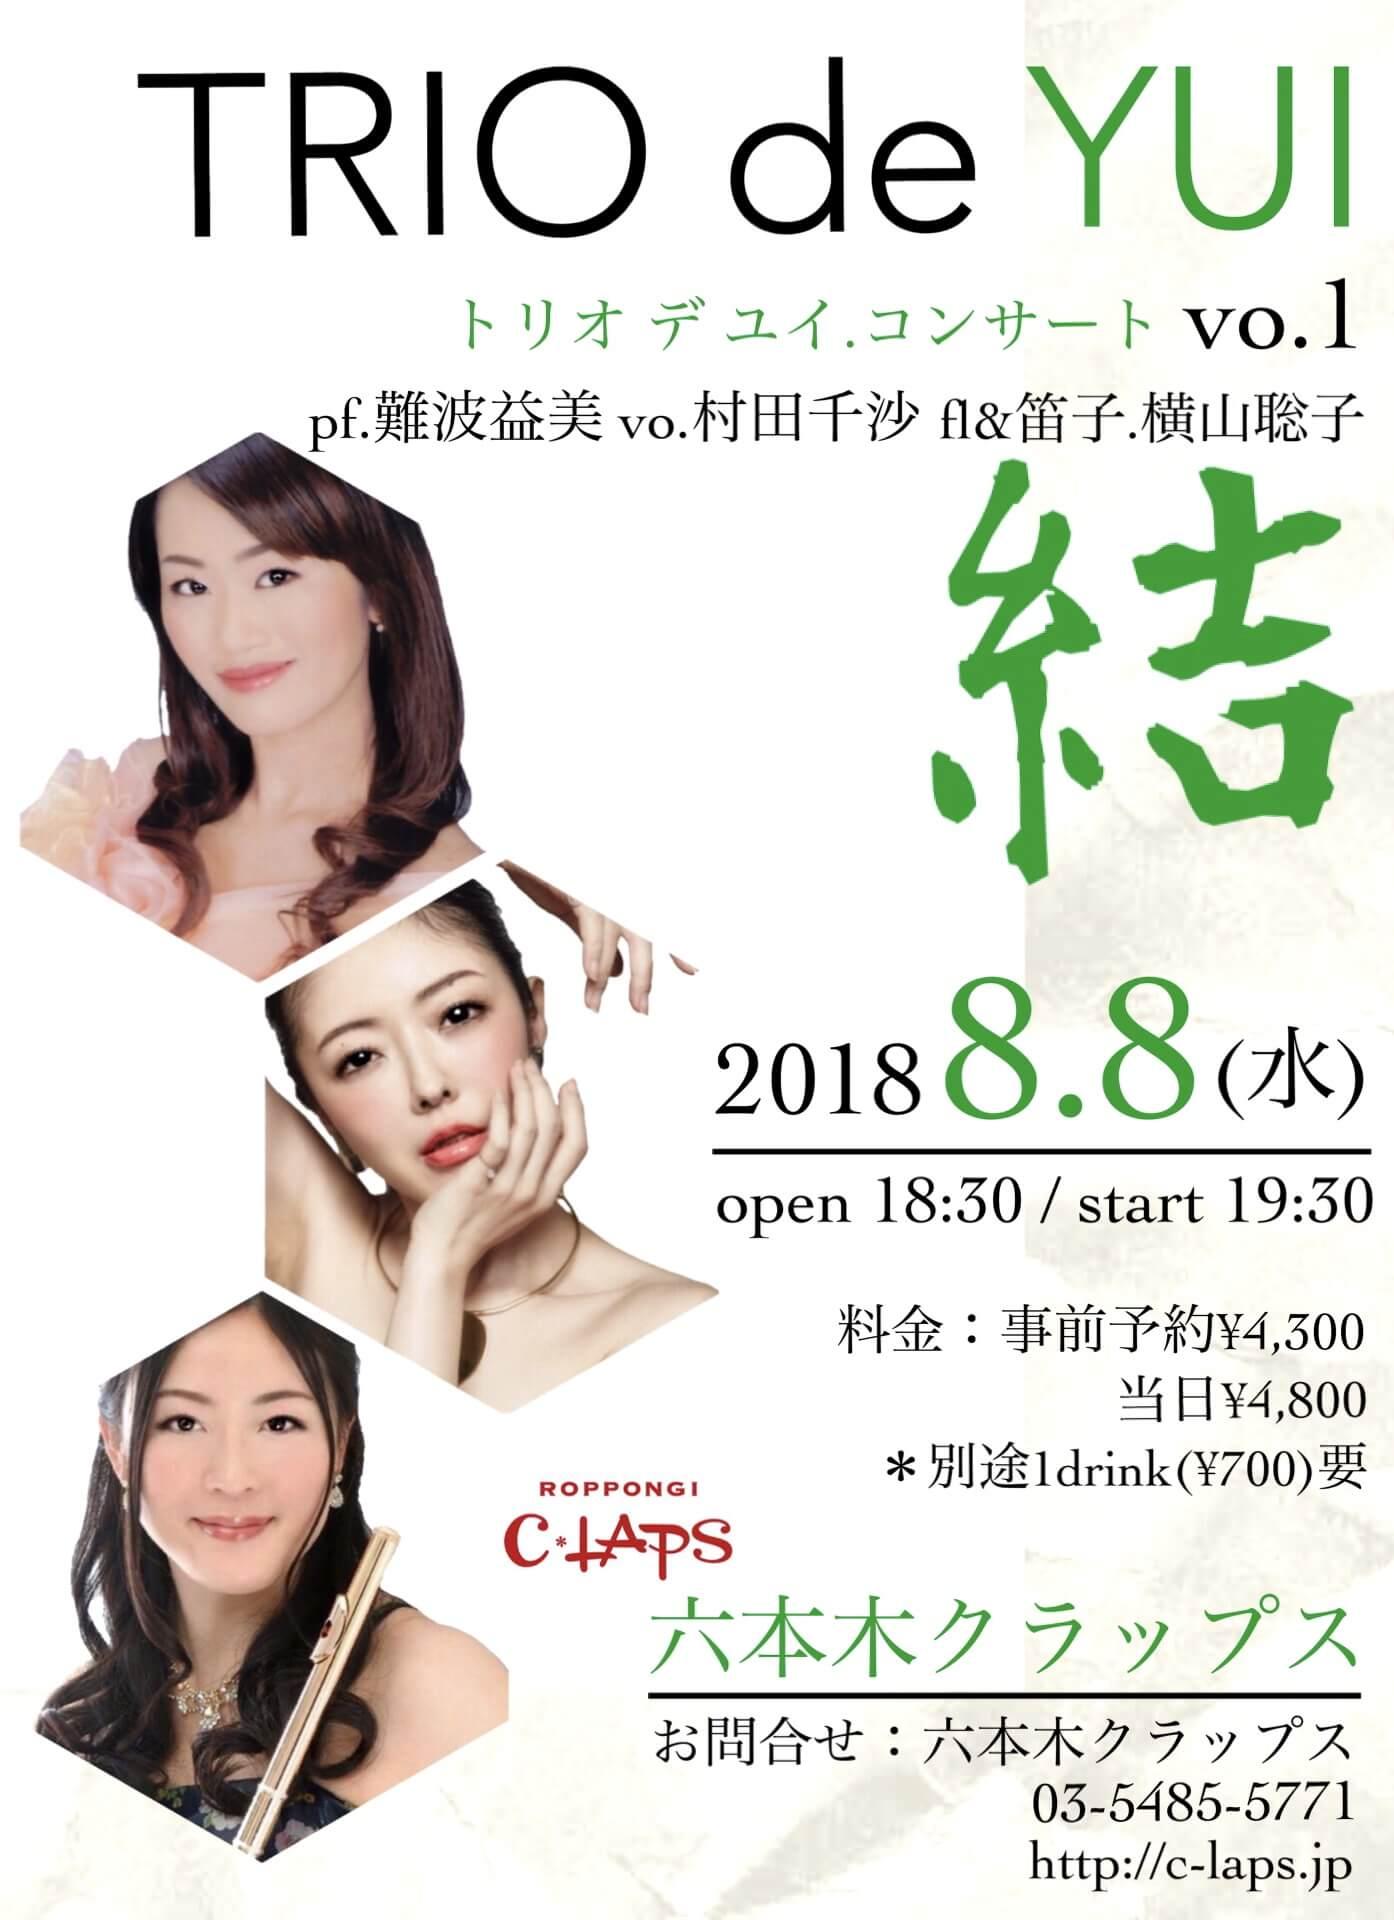 「TRIO de YUI」結成コンサートのお知らせ!8/8(水)は六本木に集合